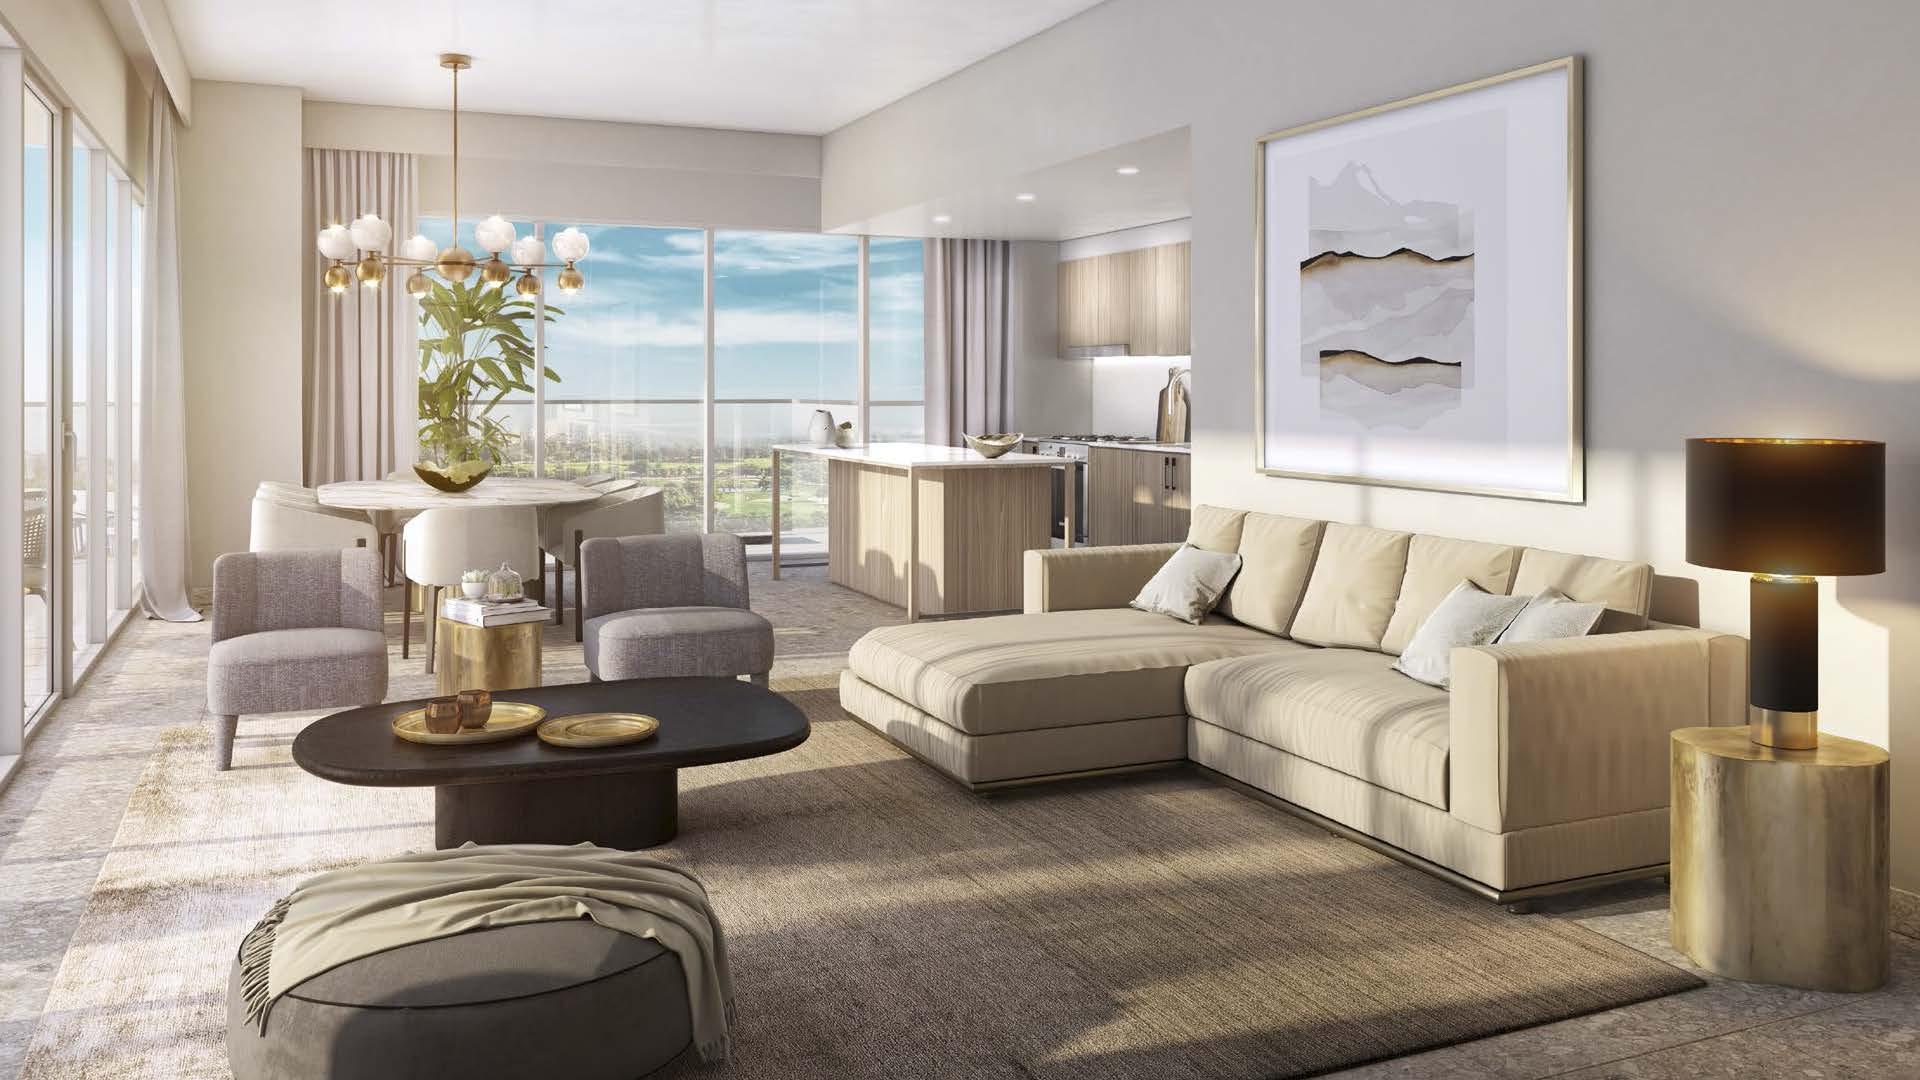 Interior Golf Suites by Emaar at Dubai Hills